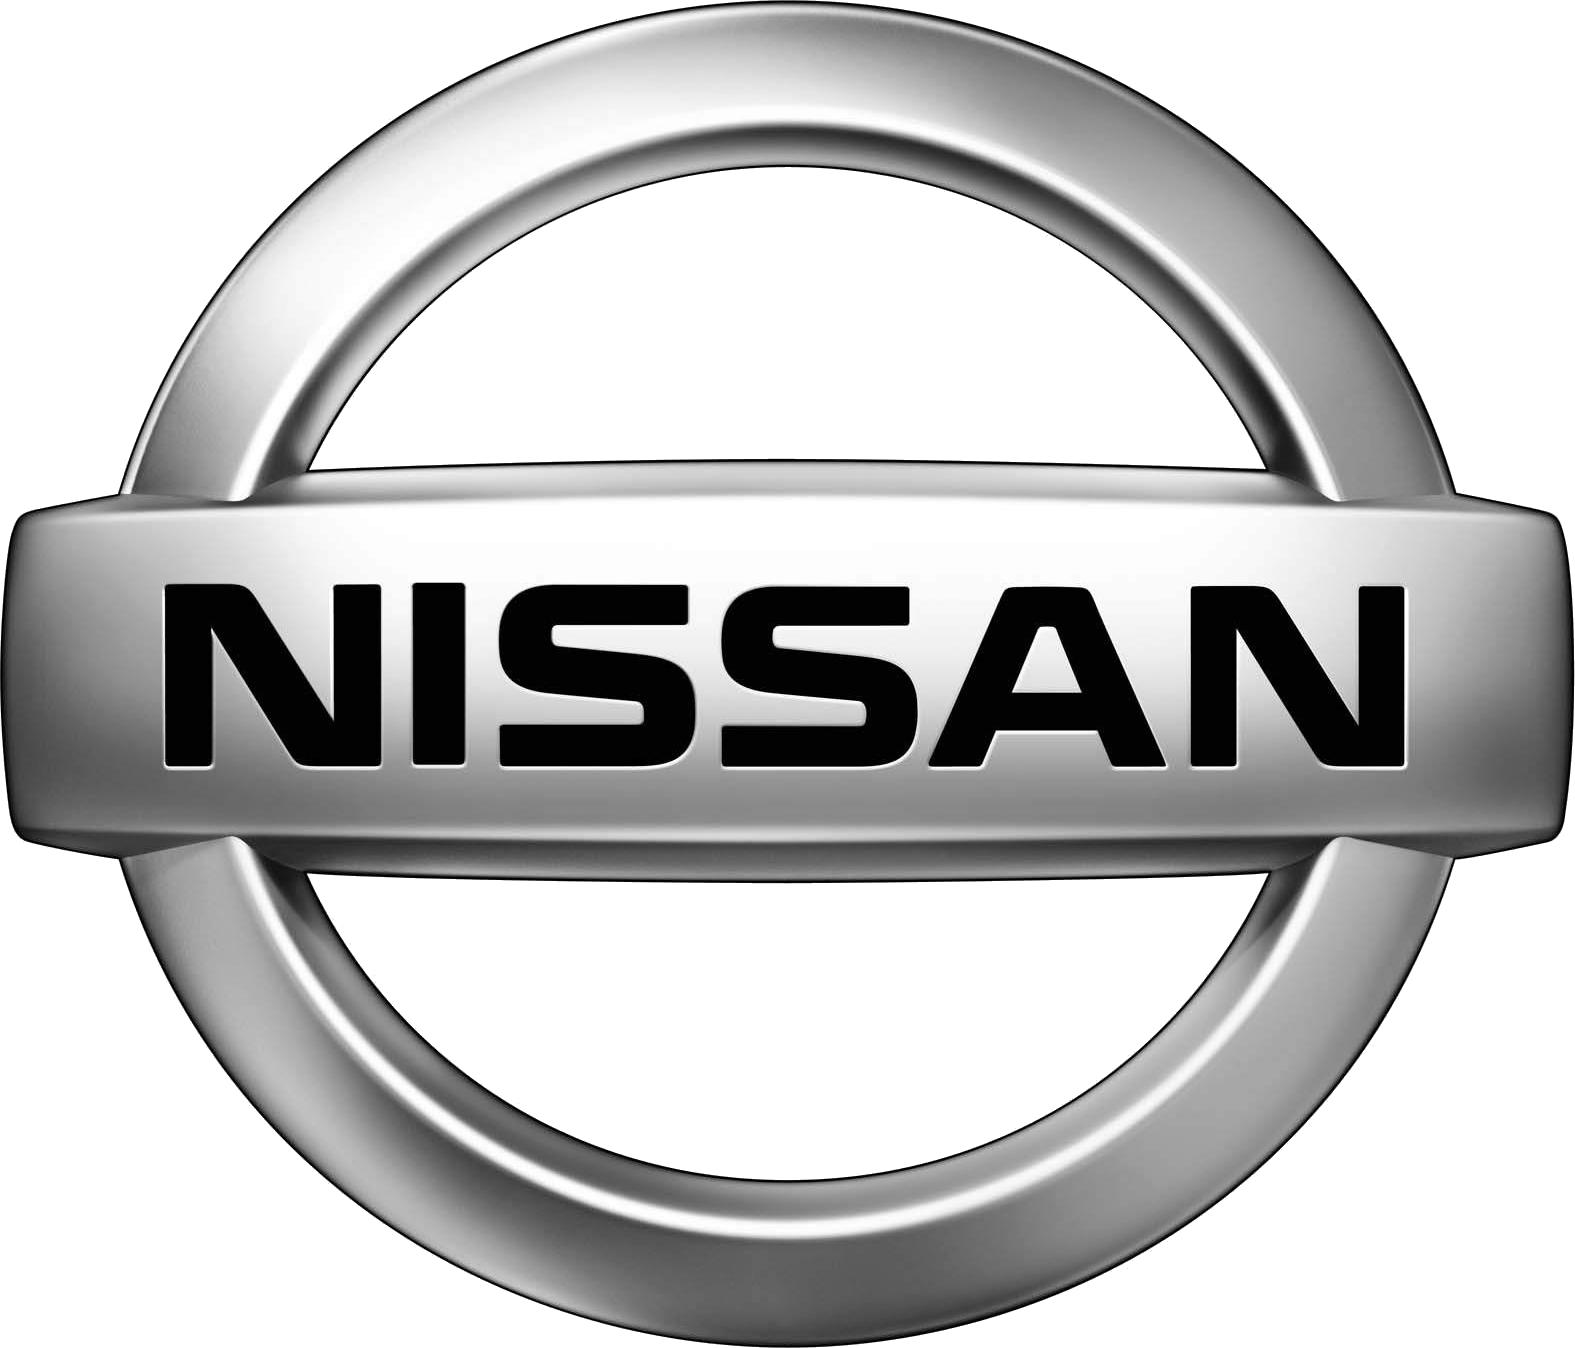 Nissan Car Logo Png Brand Image - Car, Transparent background PNG HD thumbnail